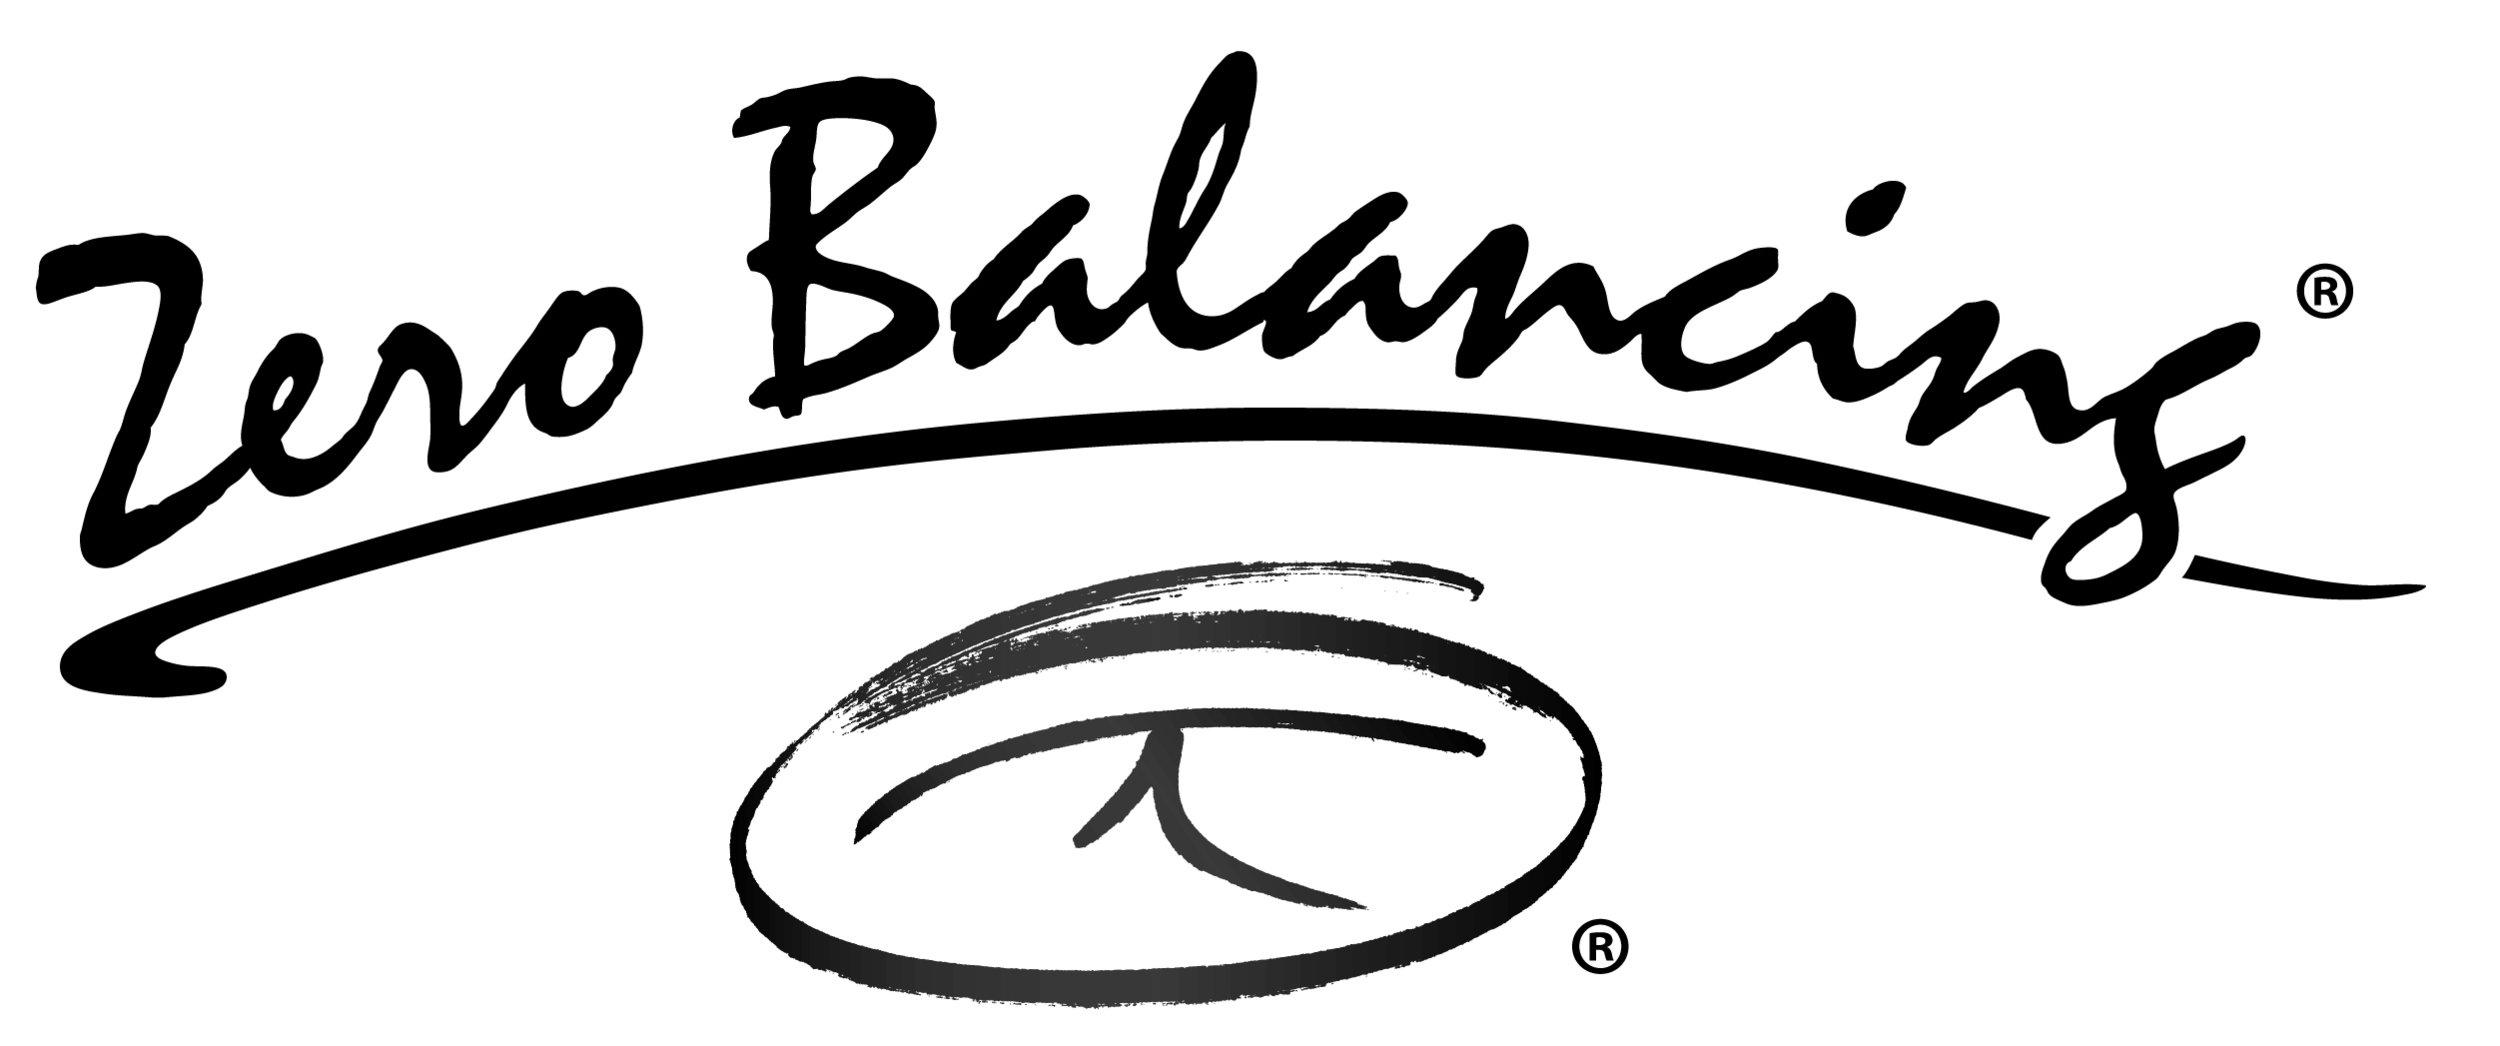 zb_logo.jpg